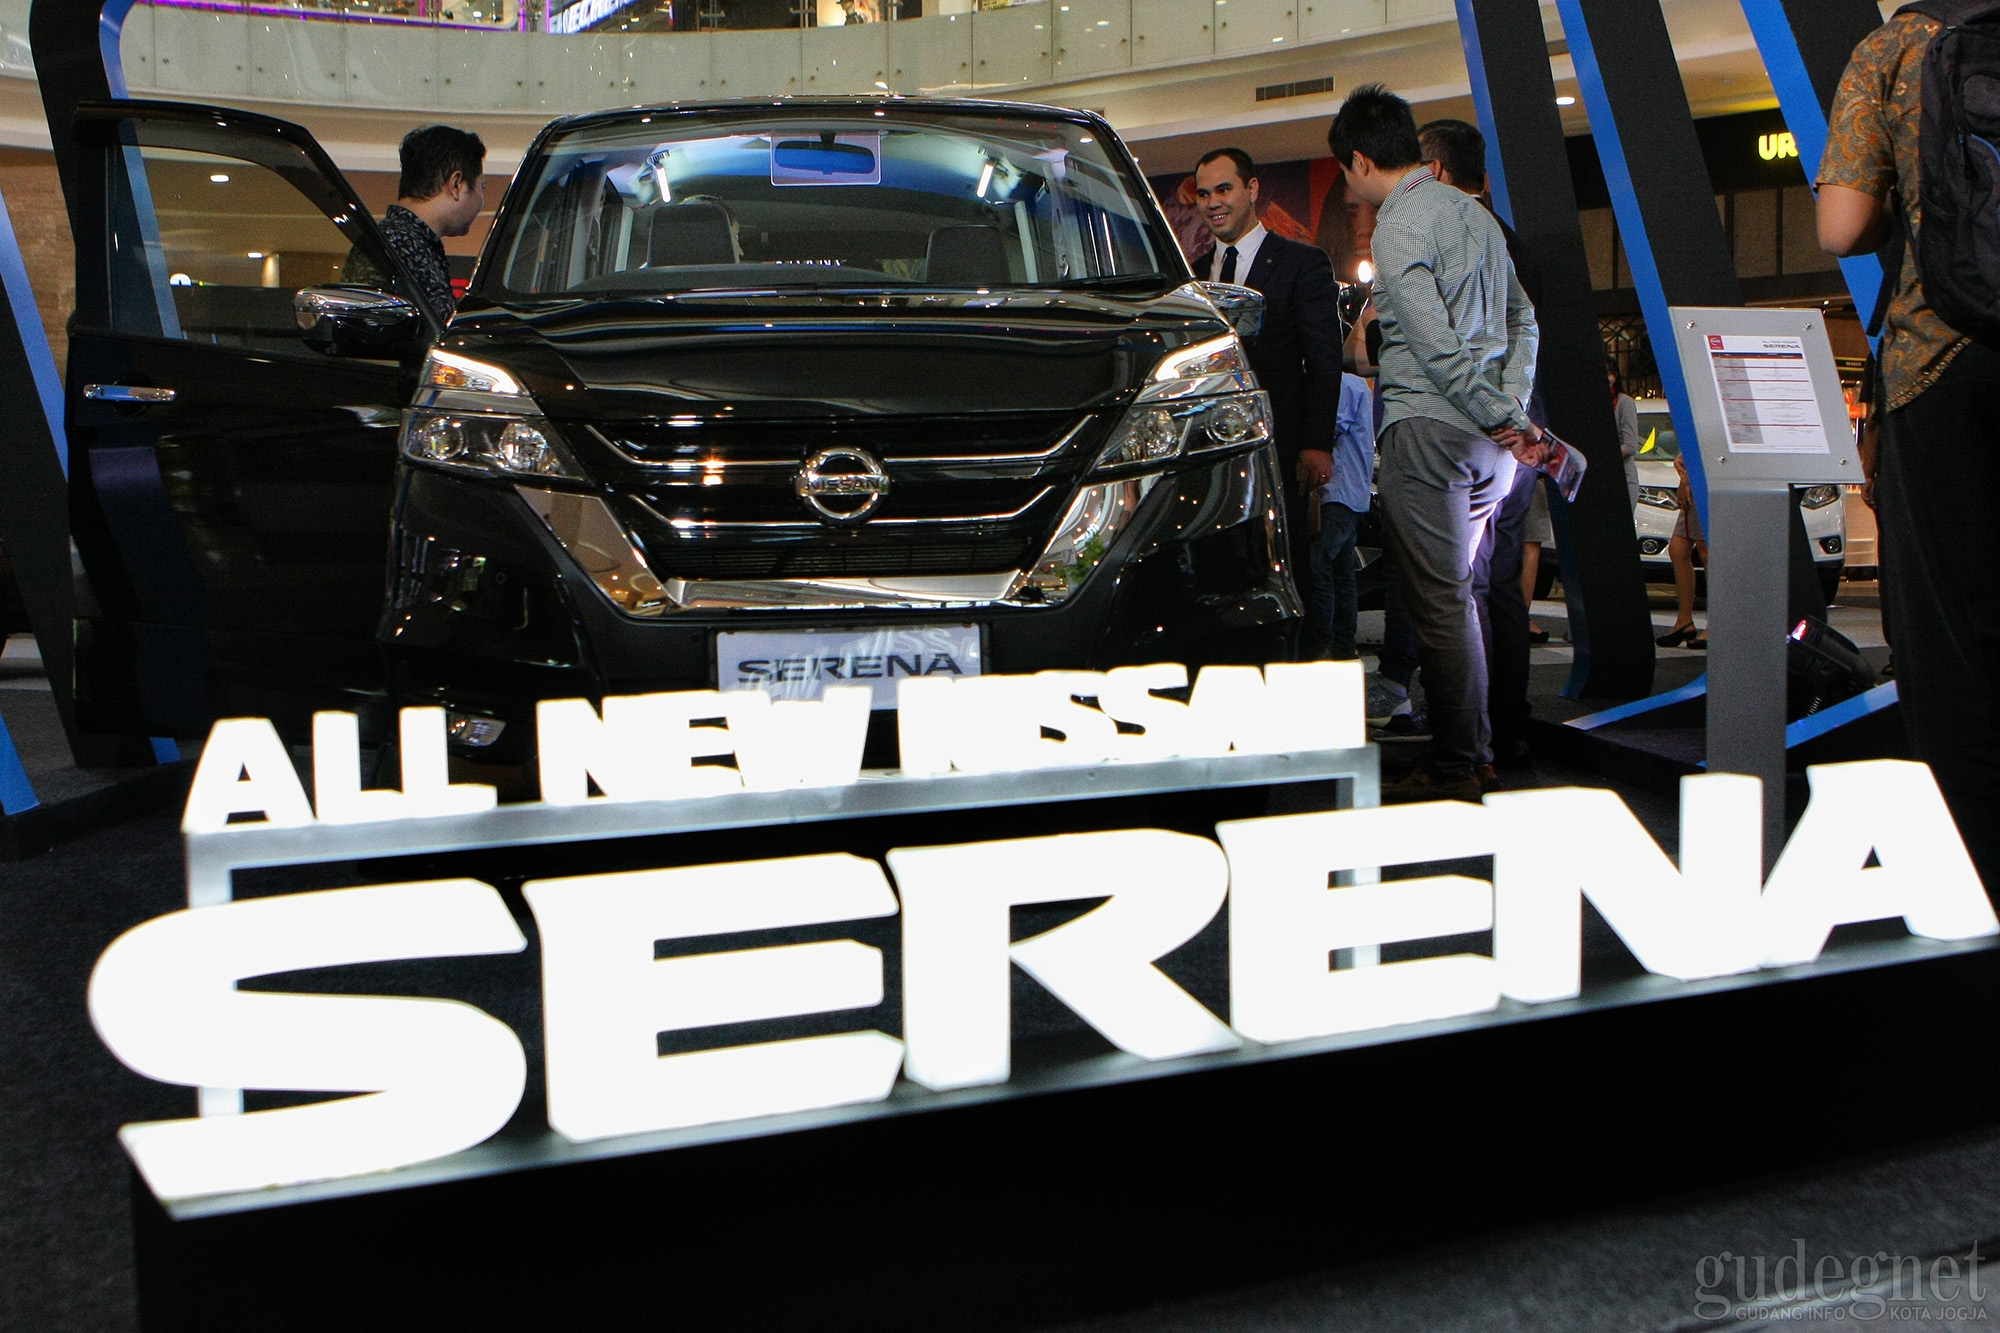 Nissan Grup Luncurkan New Livina dan Serena di Hartono Mall